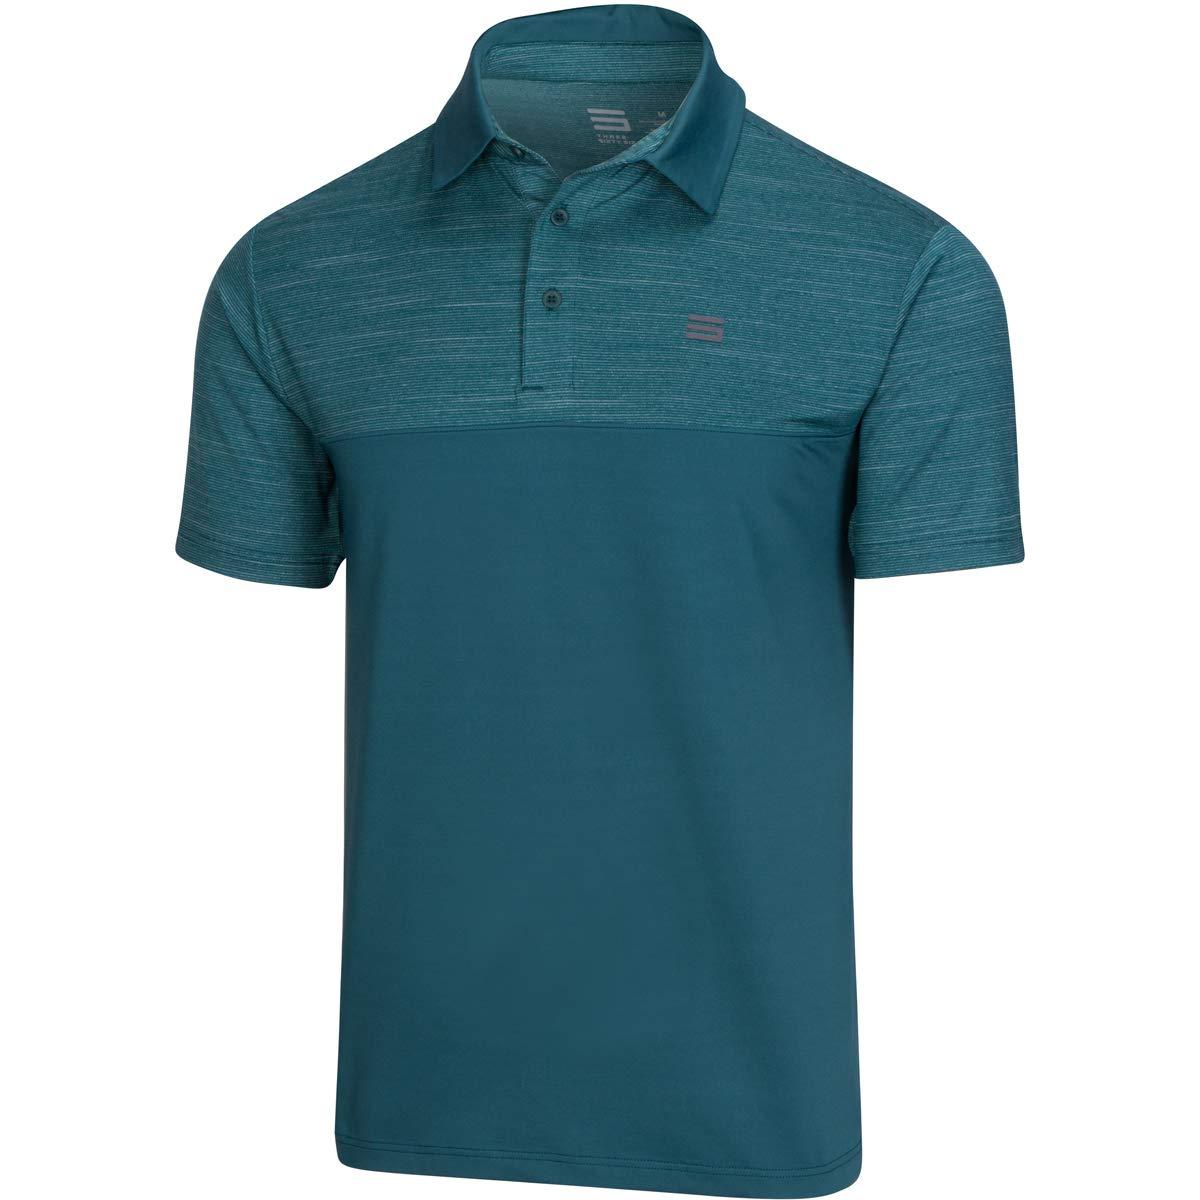 Three Sixty Six Dri-Fit Golf Shirts for Men - Moisture Wicking Short-Sleeve Polo Shirt Green Teal by Three Sixty Six